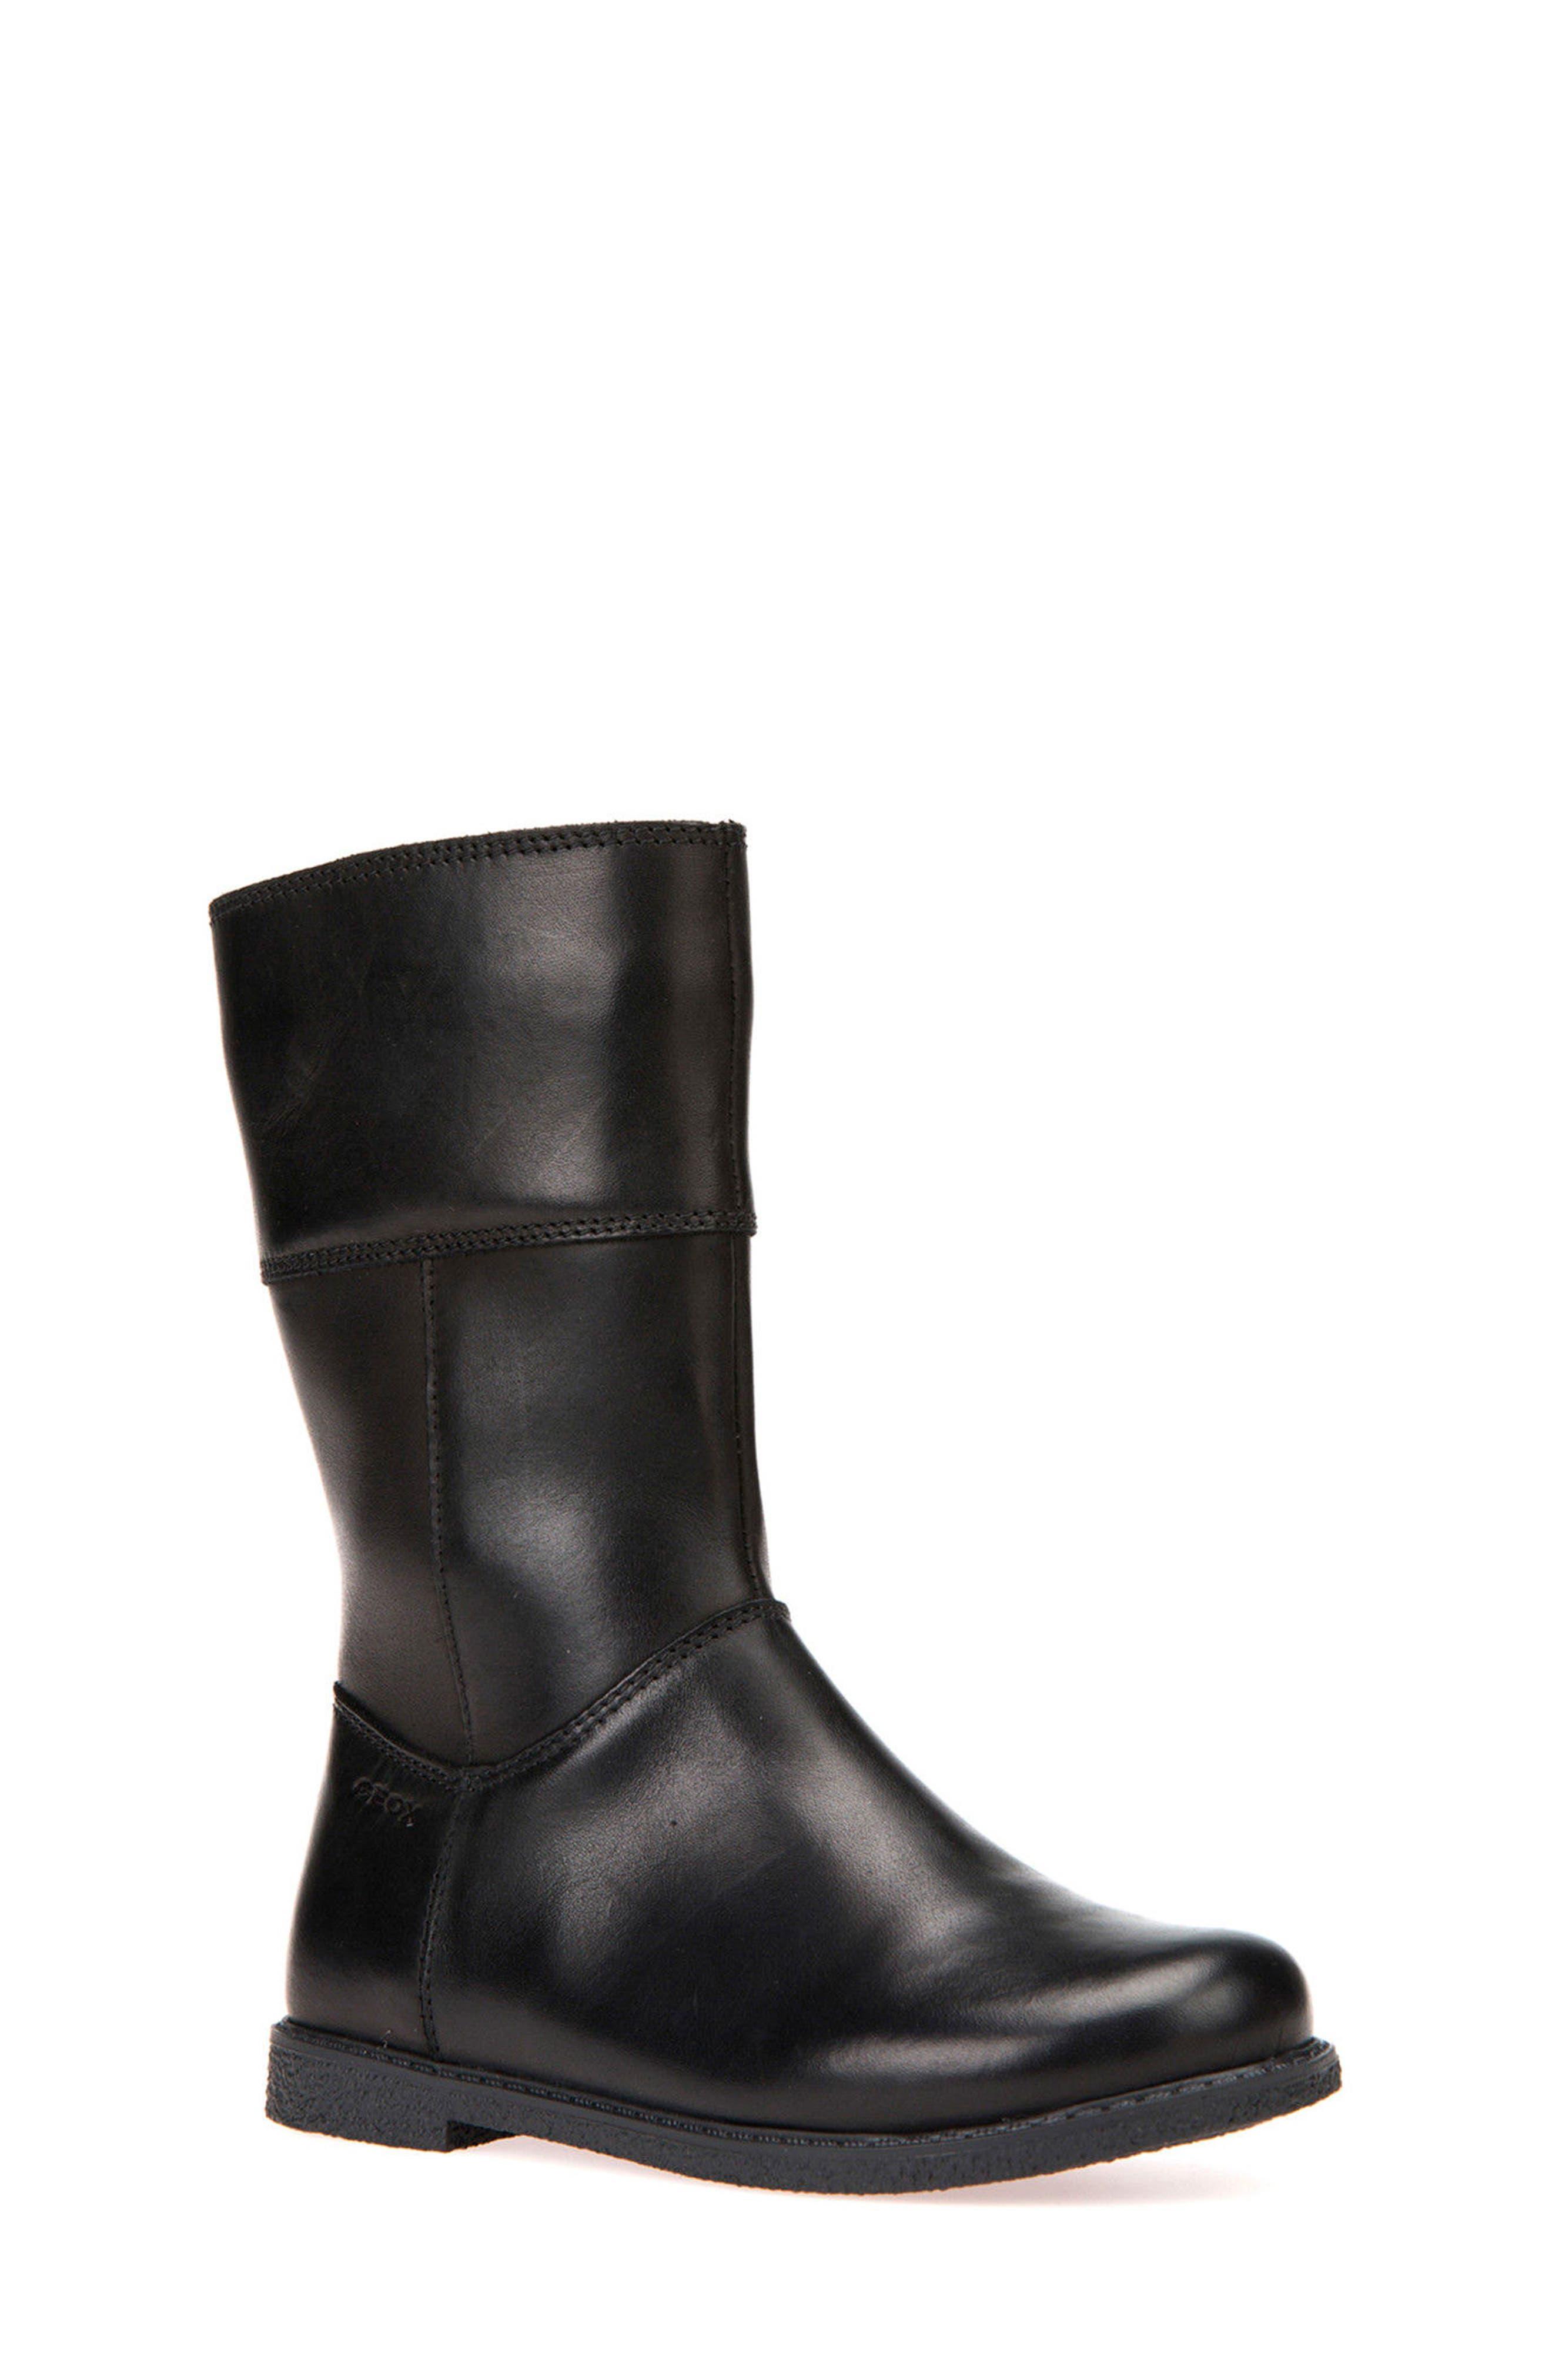 Alternate Image 1 Selected - Geox Shawntel Tall Boot (Toddler, Little Kid & Big Kid)